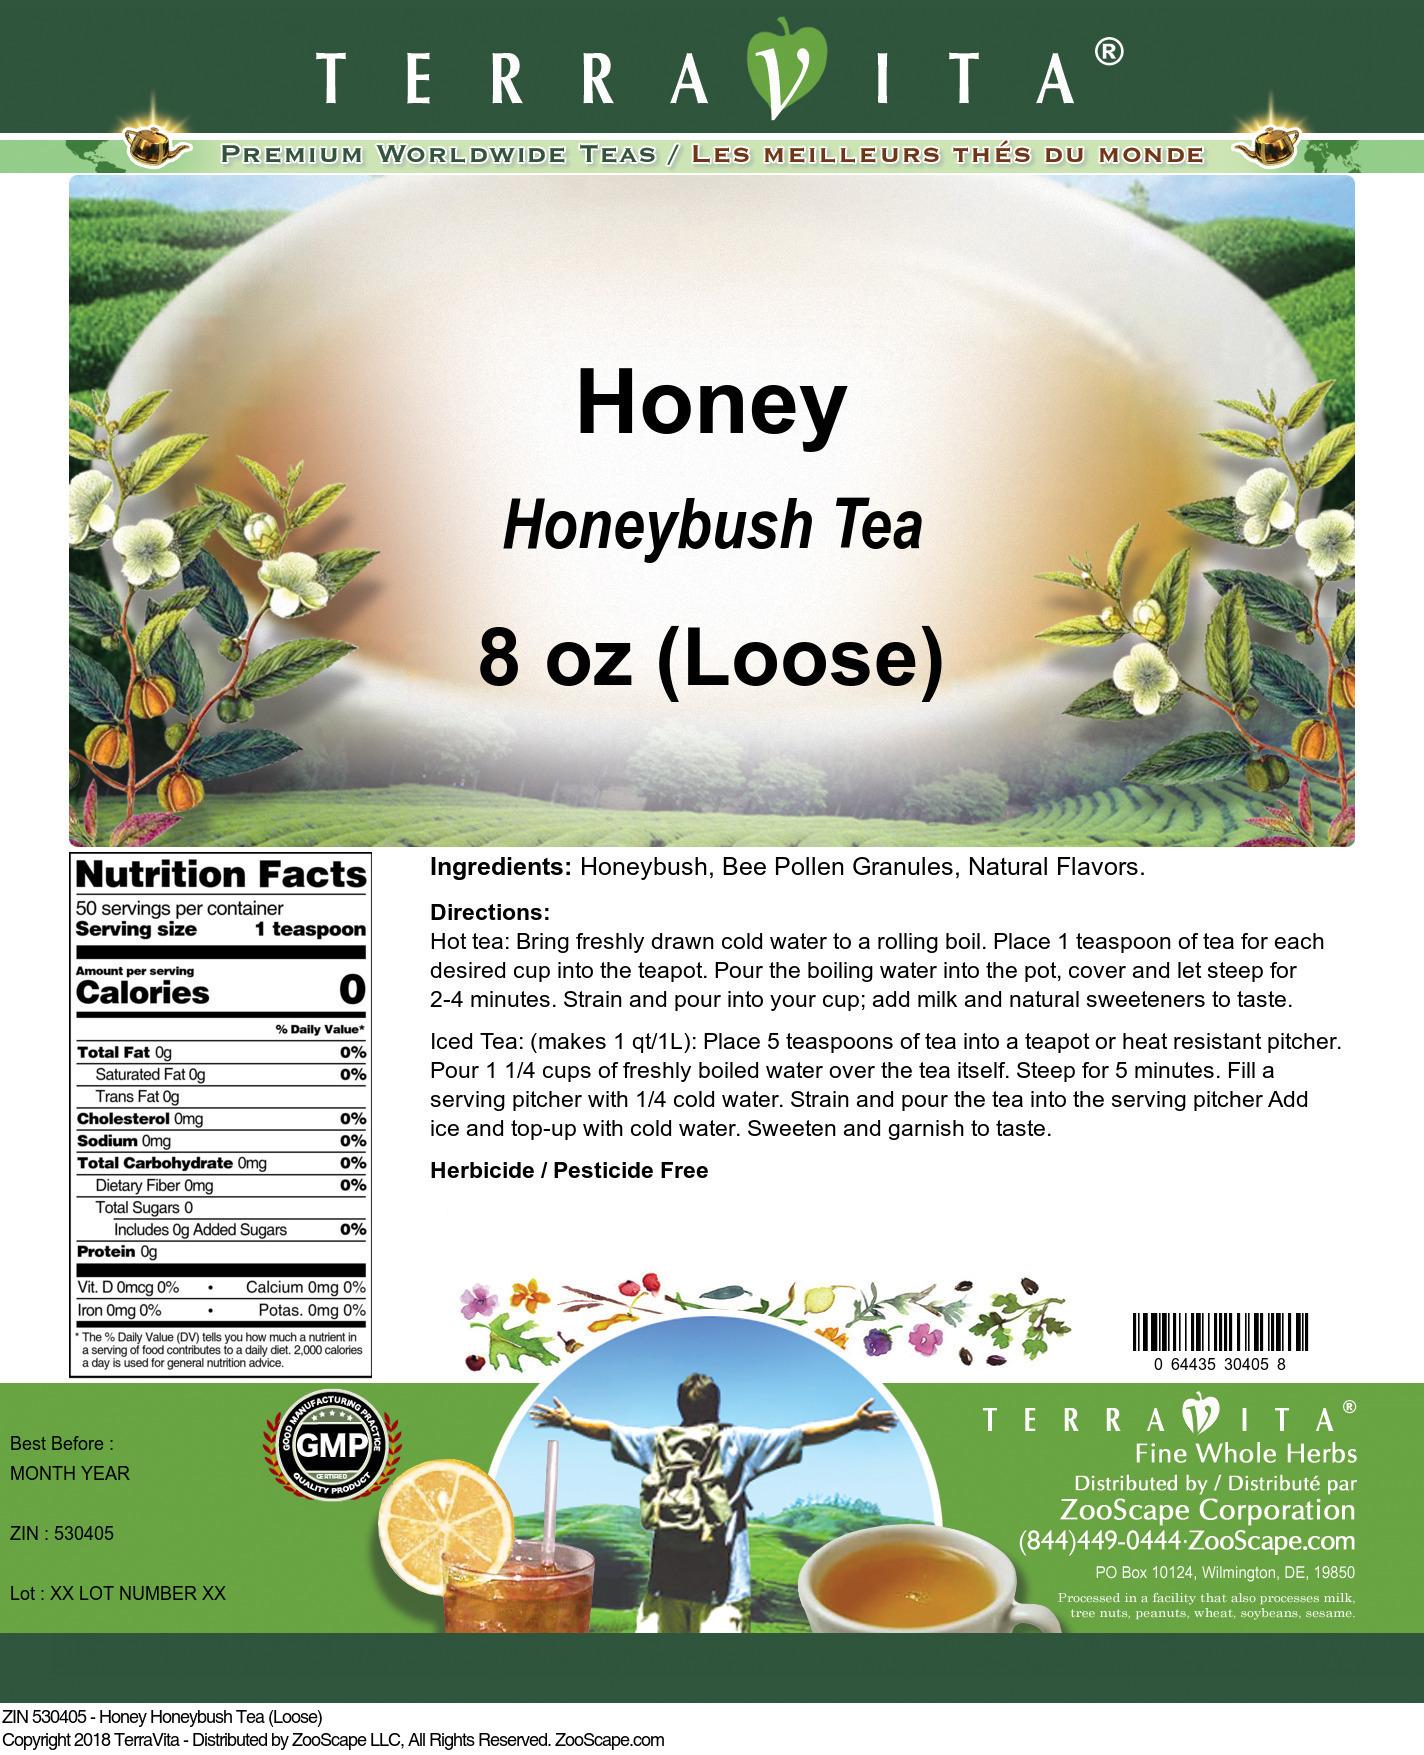 Honey Honeybush Tea (Loose)